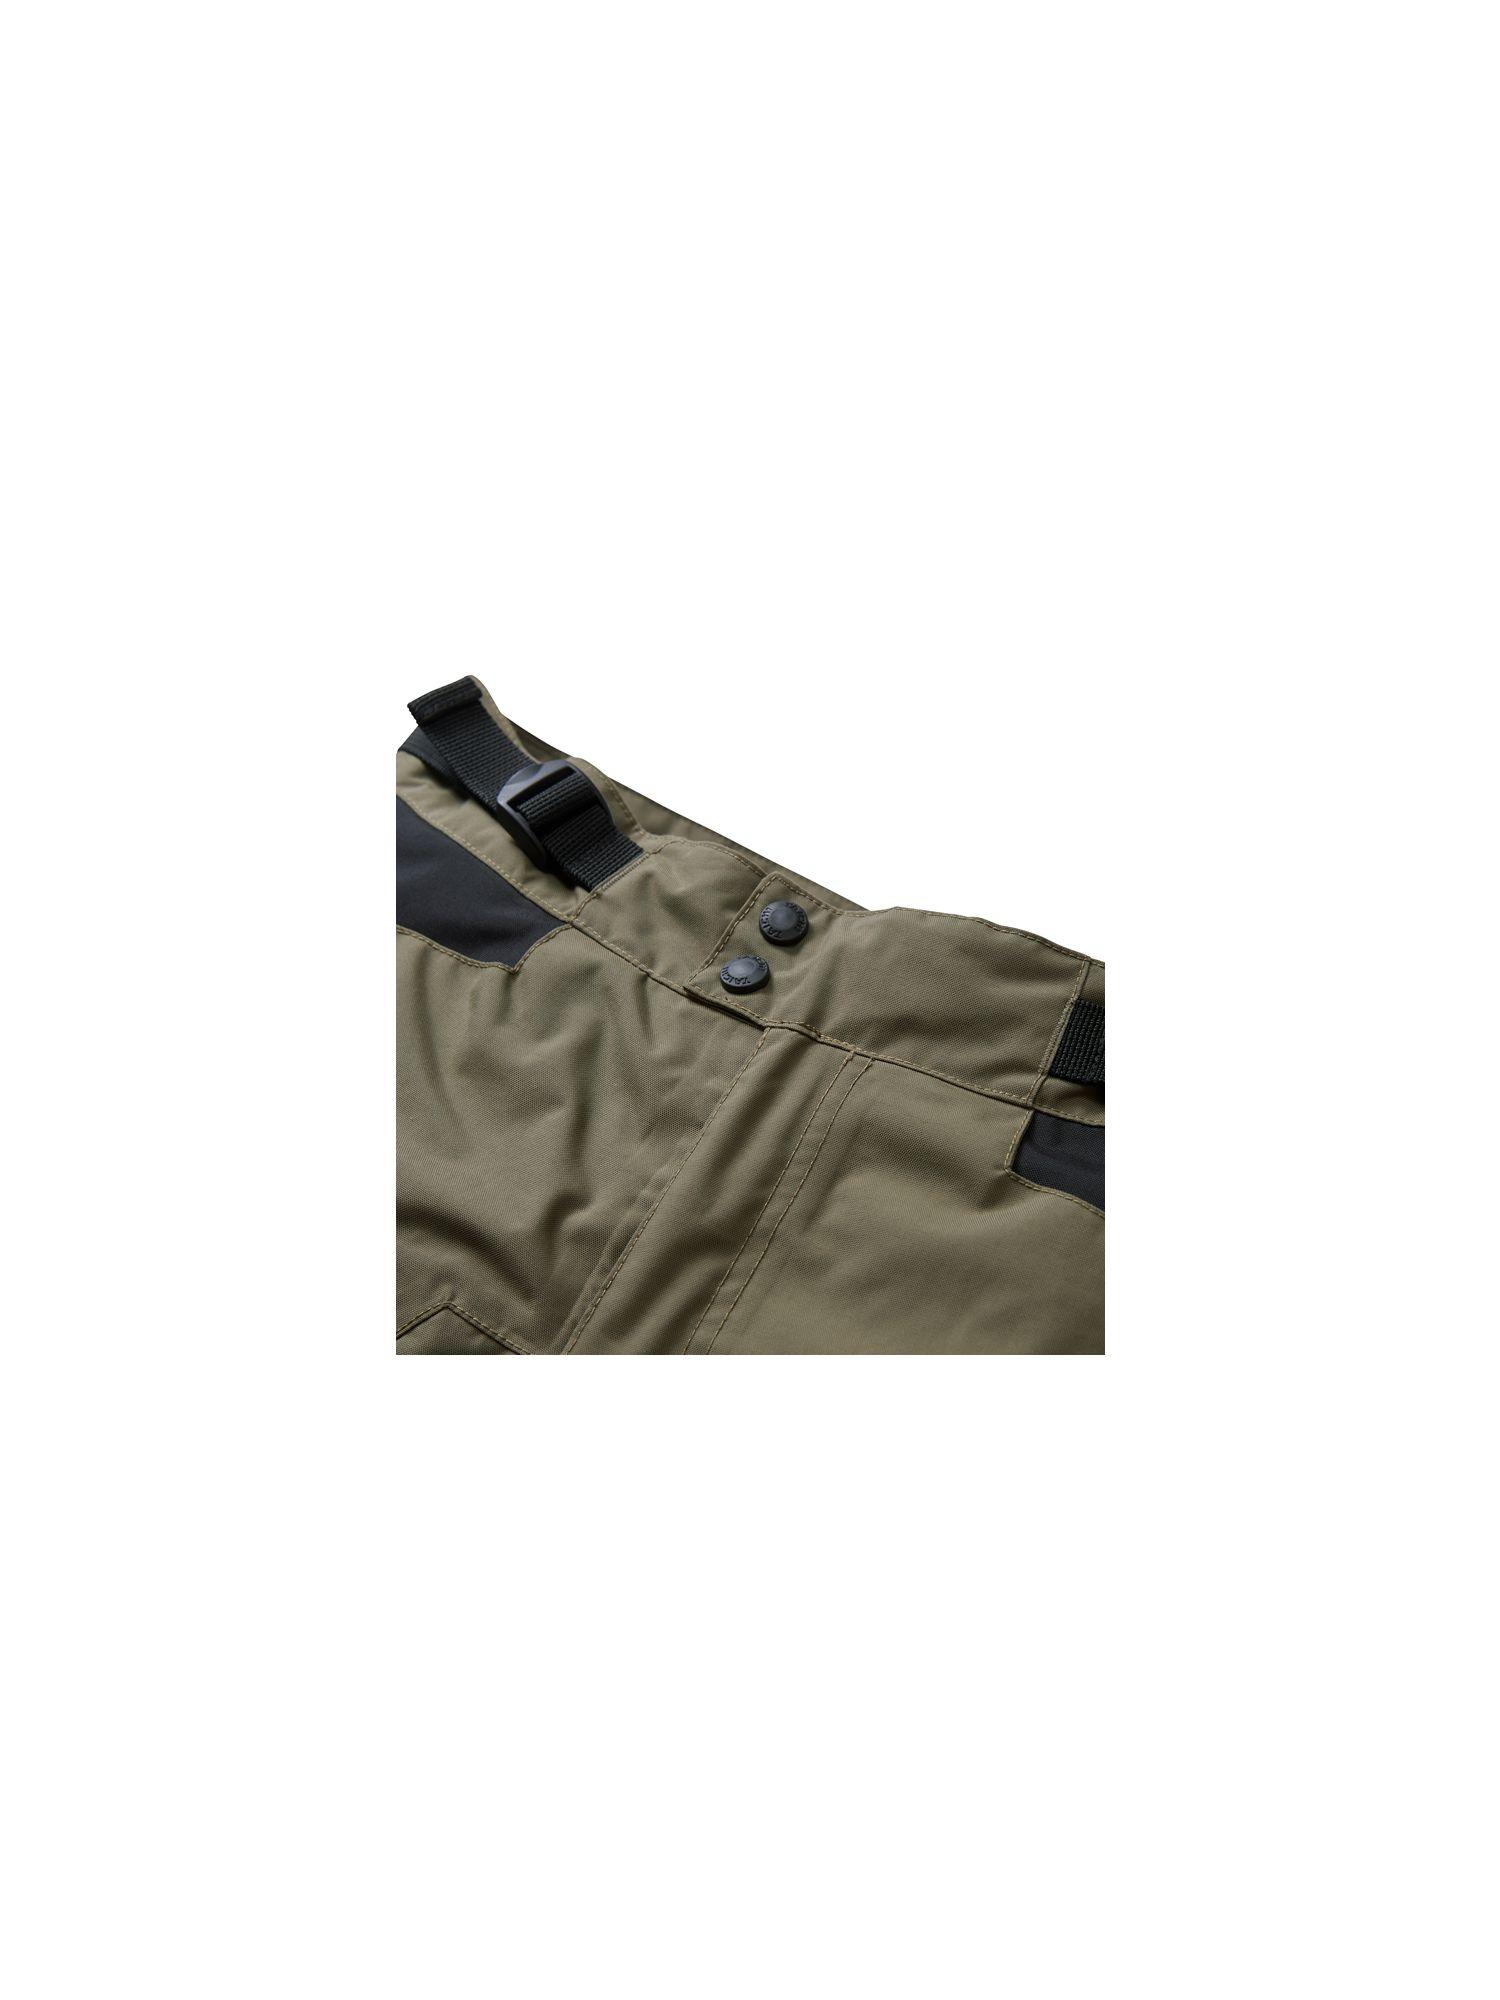 RSY261 | DRYMASTER EXPLORER PANTS[3colors]